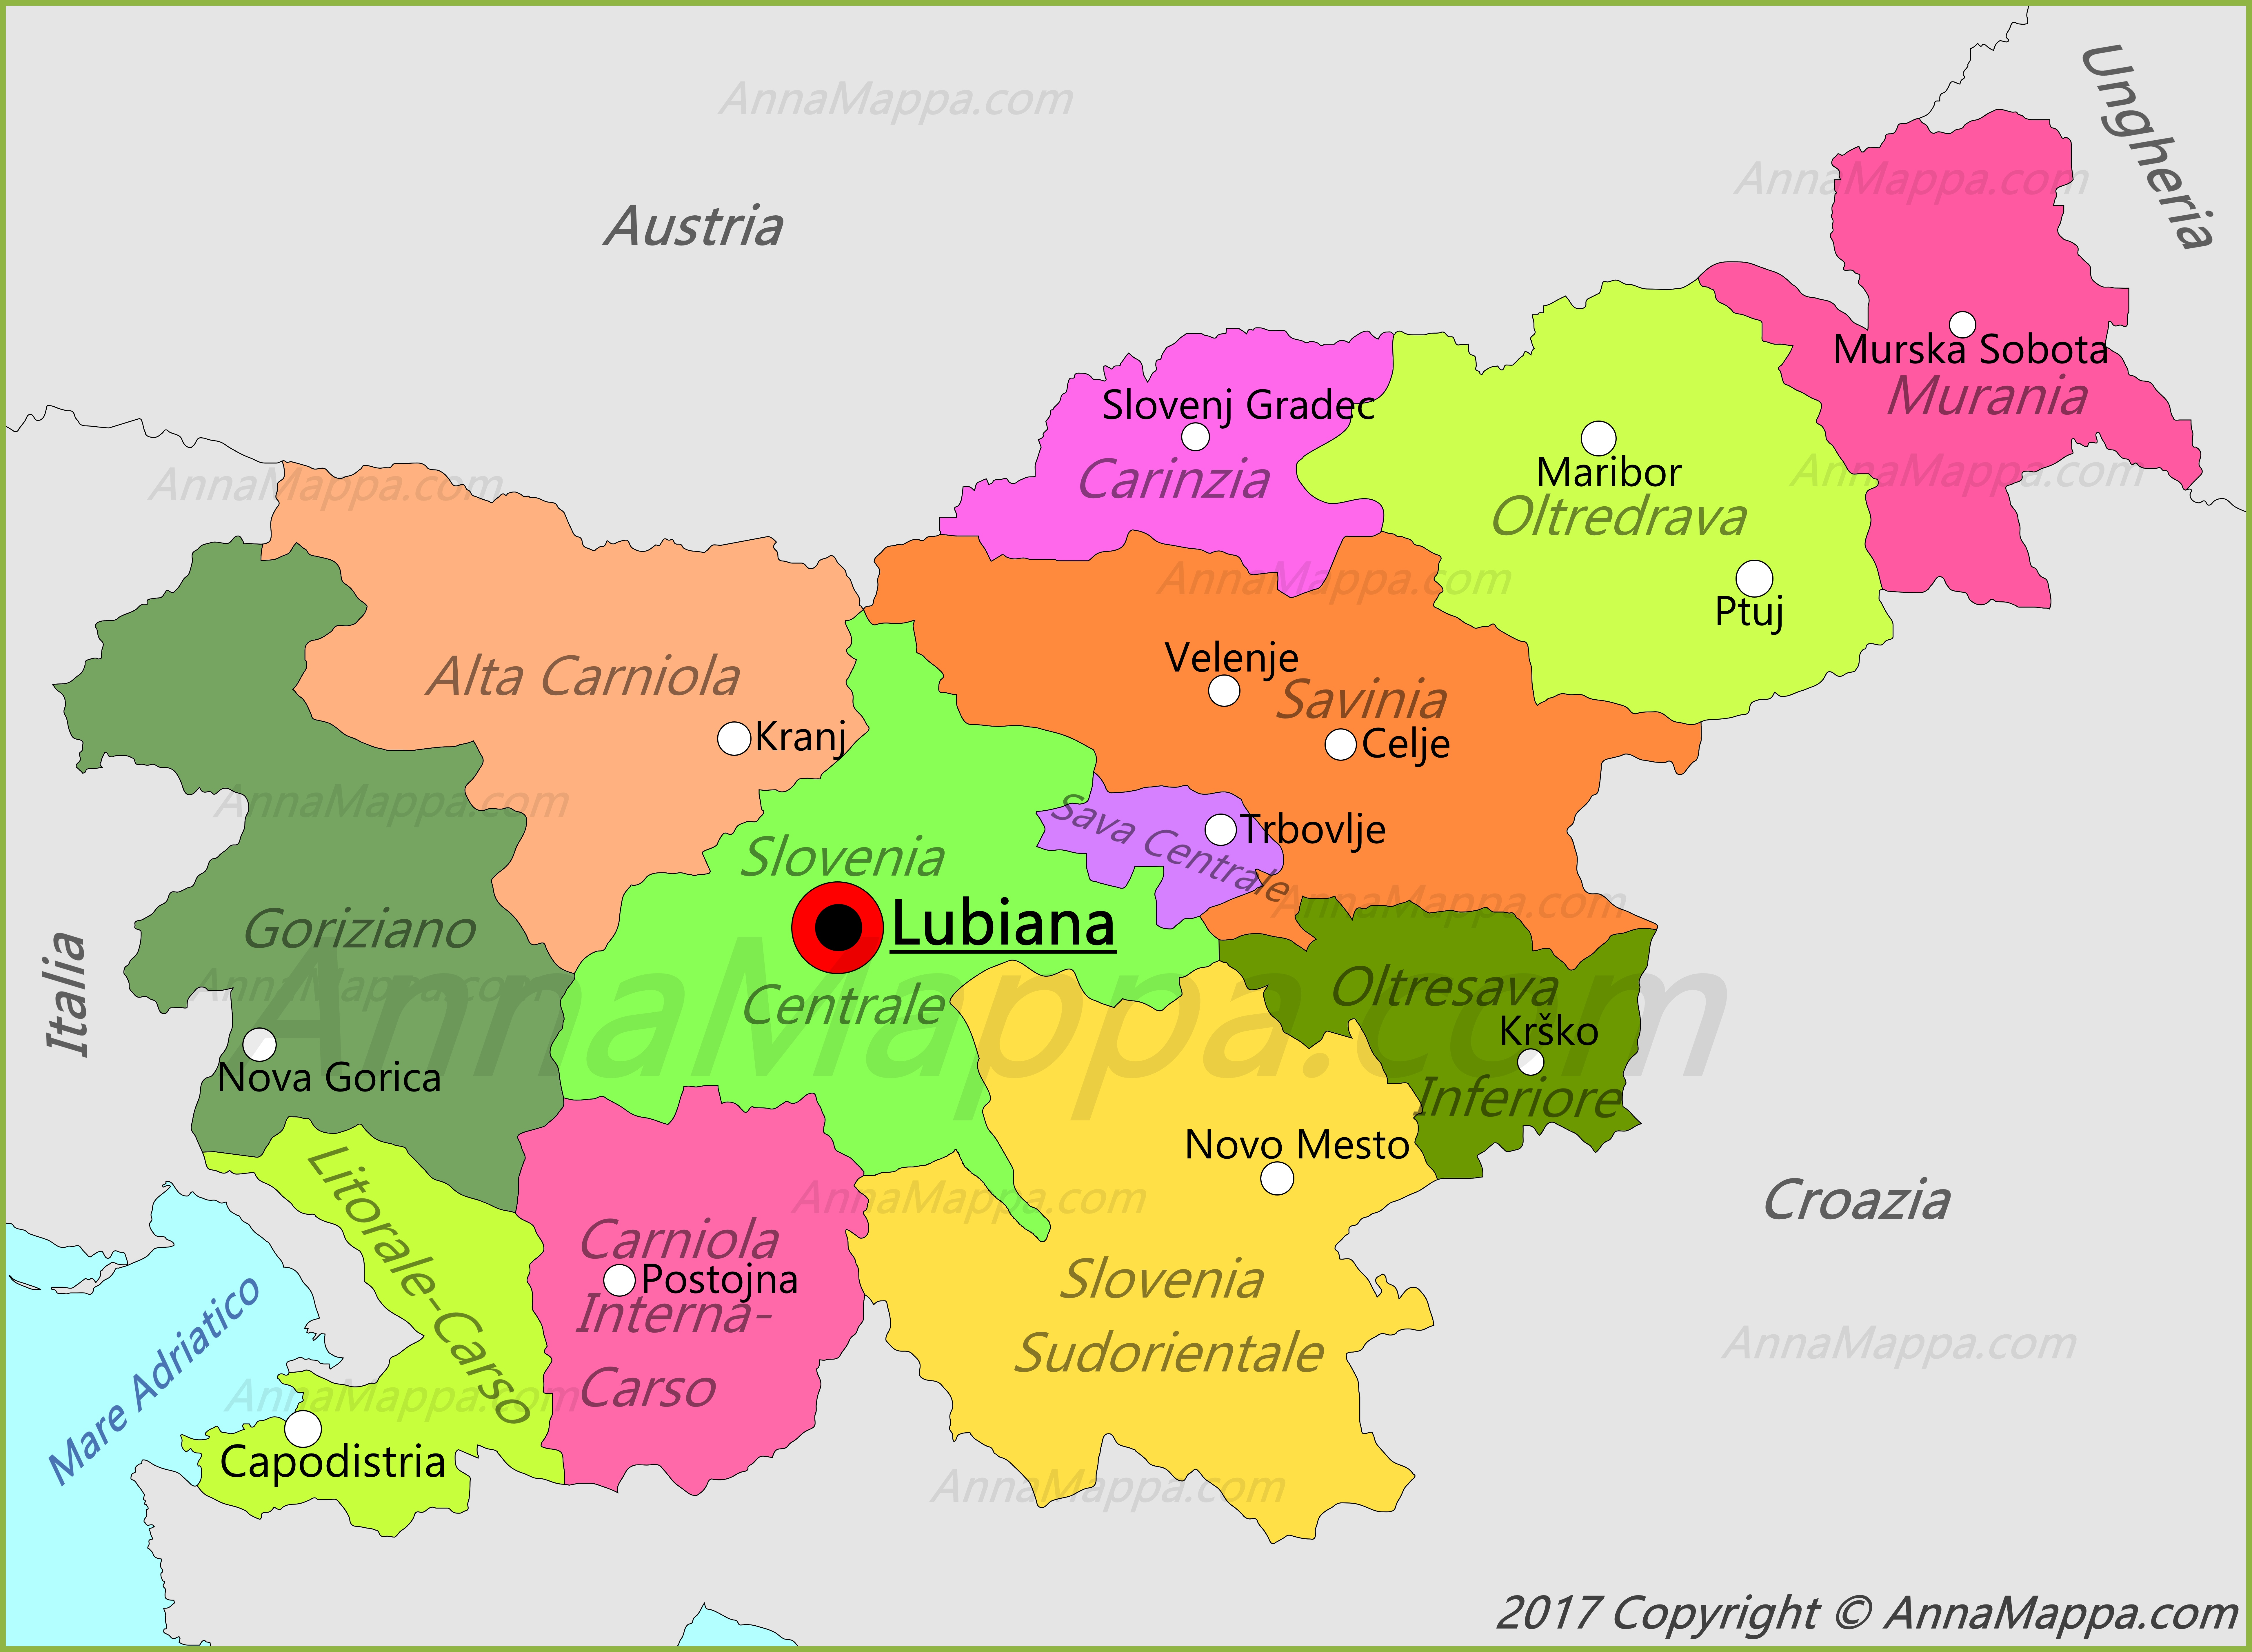 Cartina Turistica Slovenia.Mappa Slovenia Annamappa Com